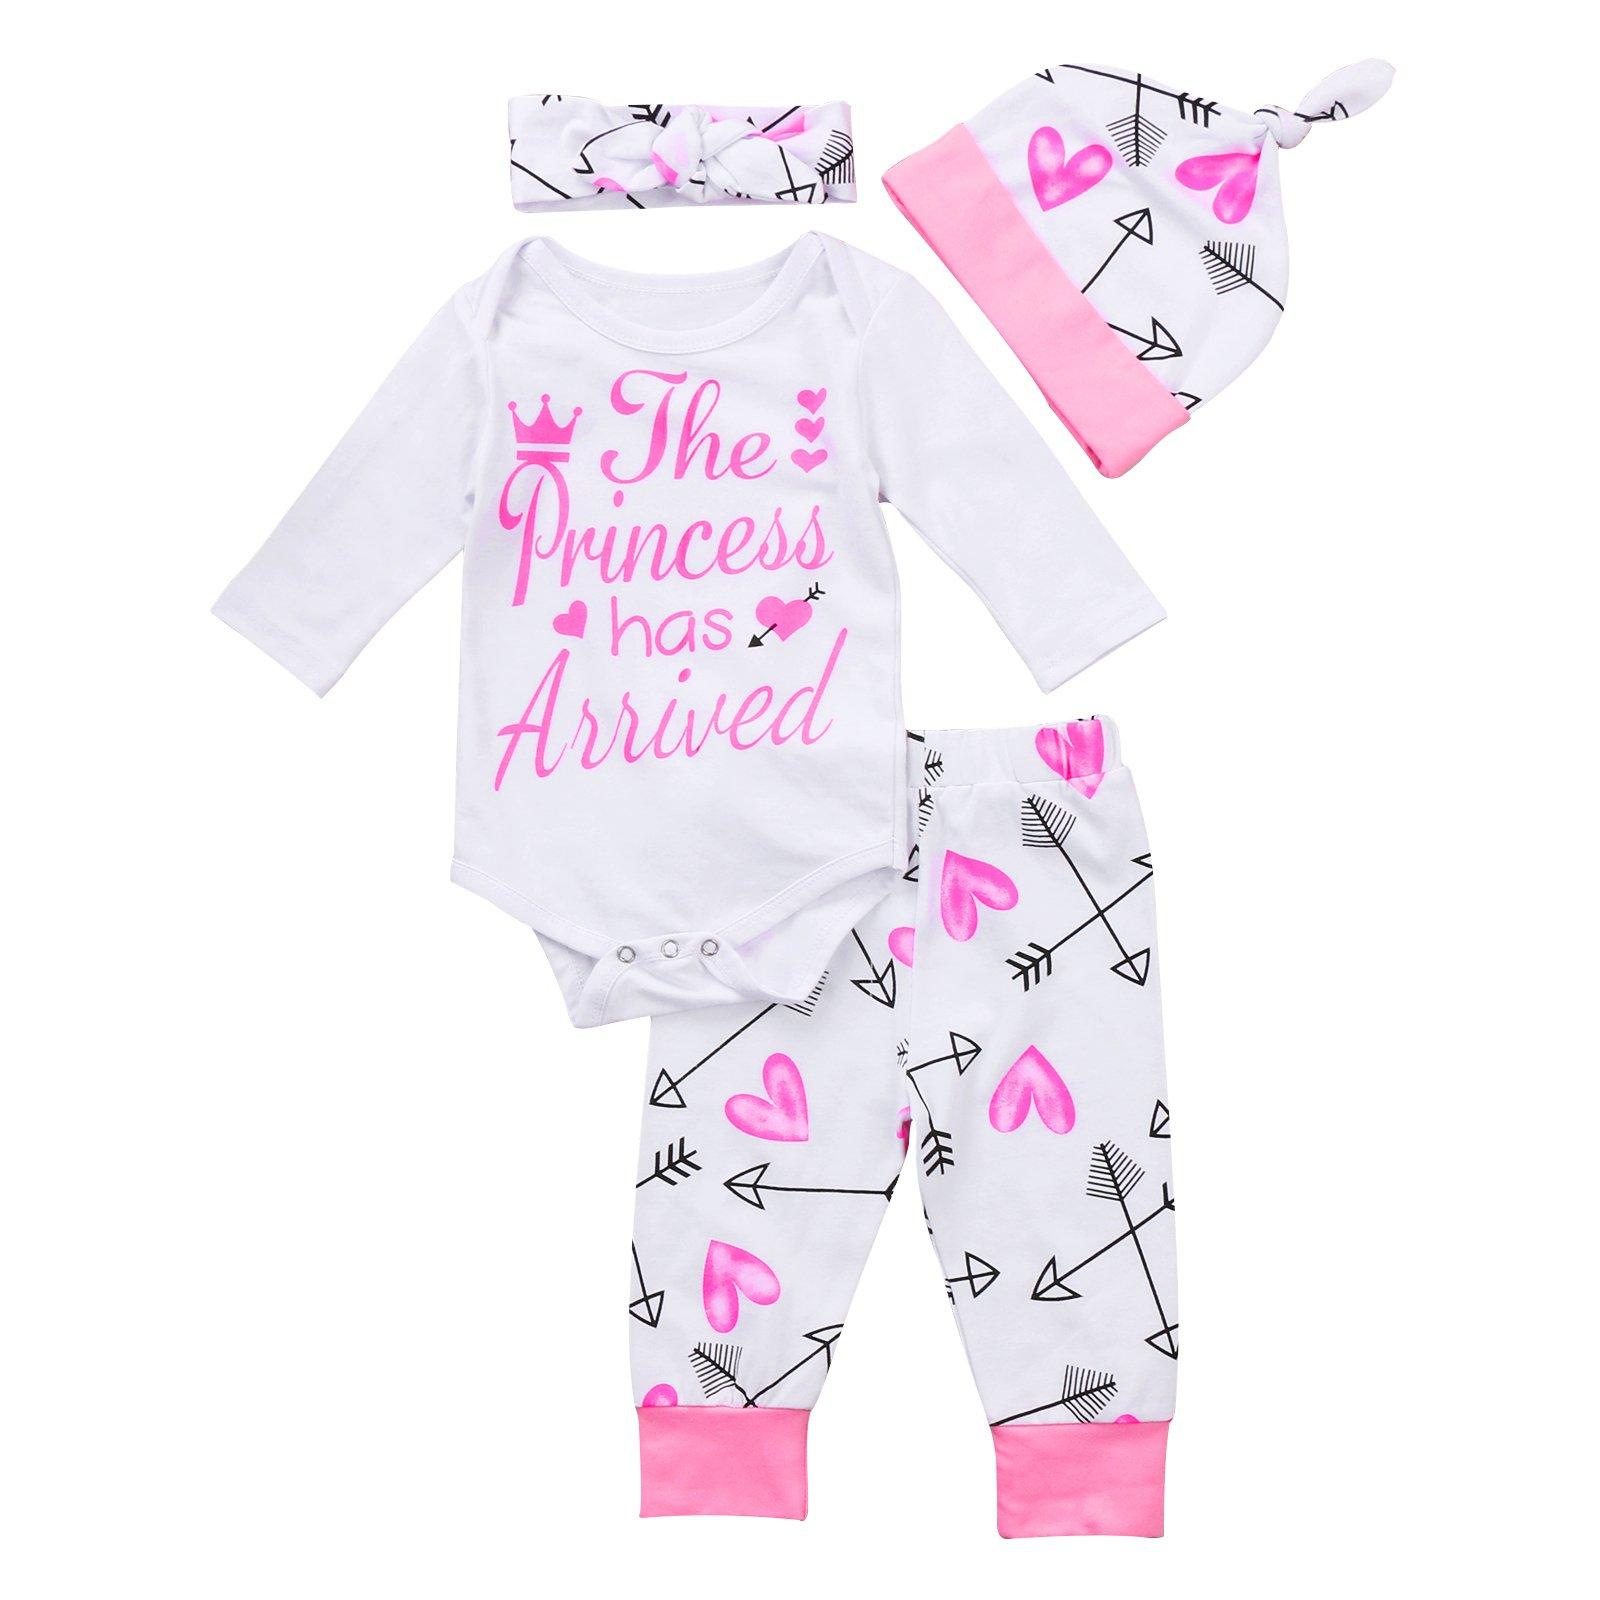 4 pcs Baby Girls Pants Set Newborn Infant Toddler Letter Romper Arrow Heart Pants Hats Headband Clothes (0-6 Months, Pink)